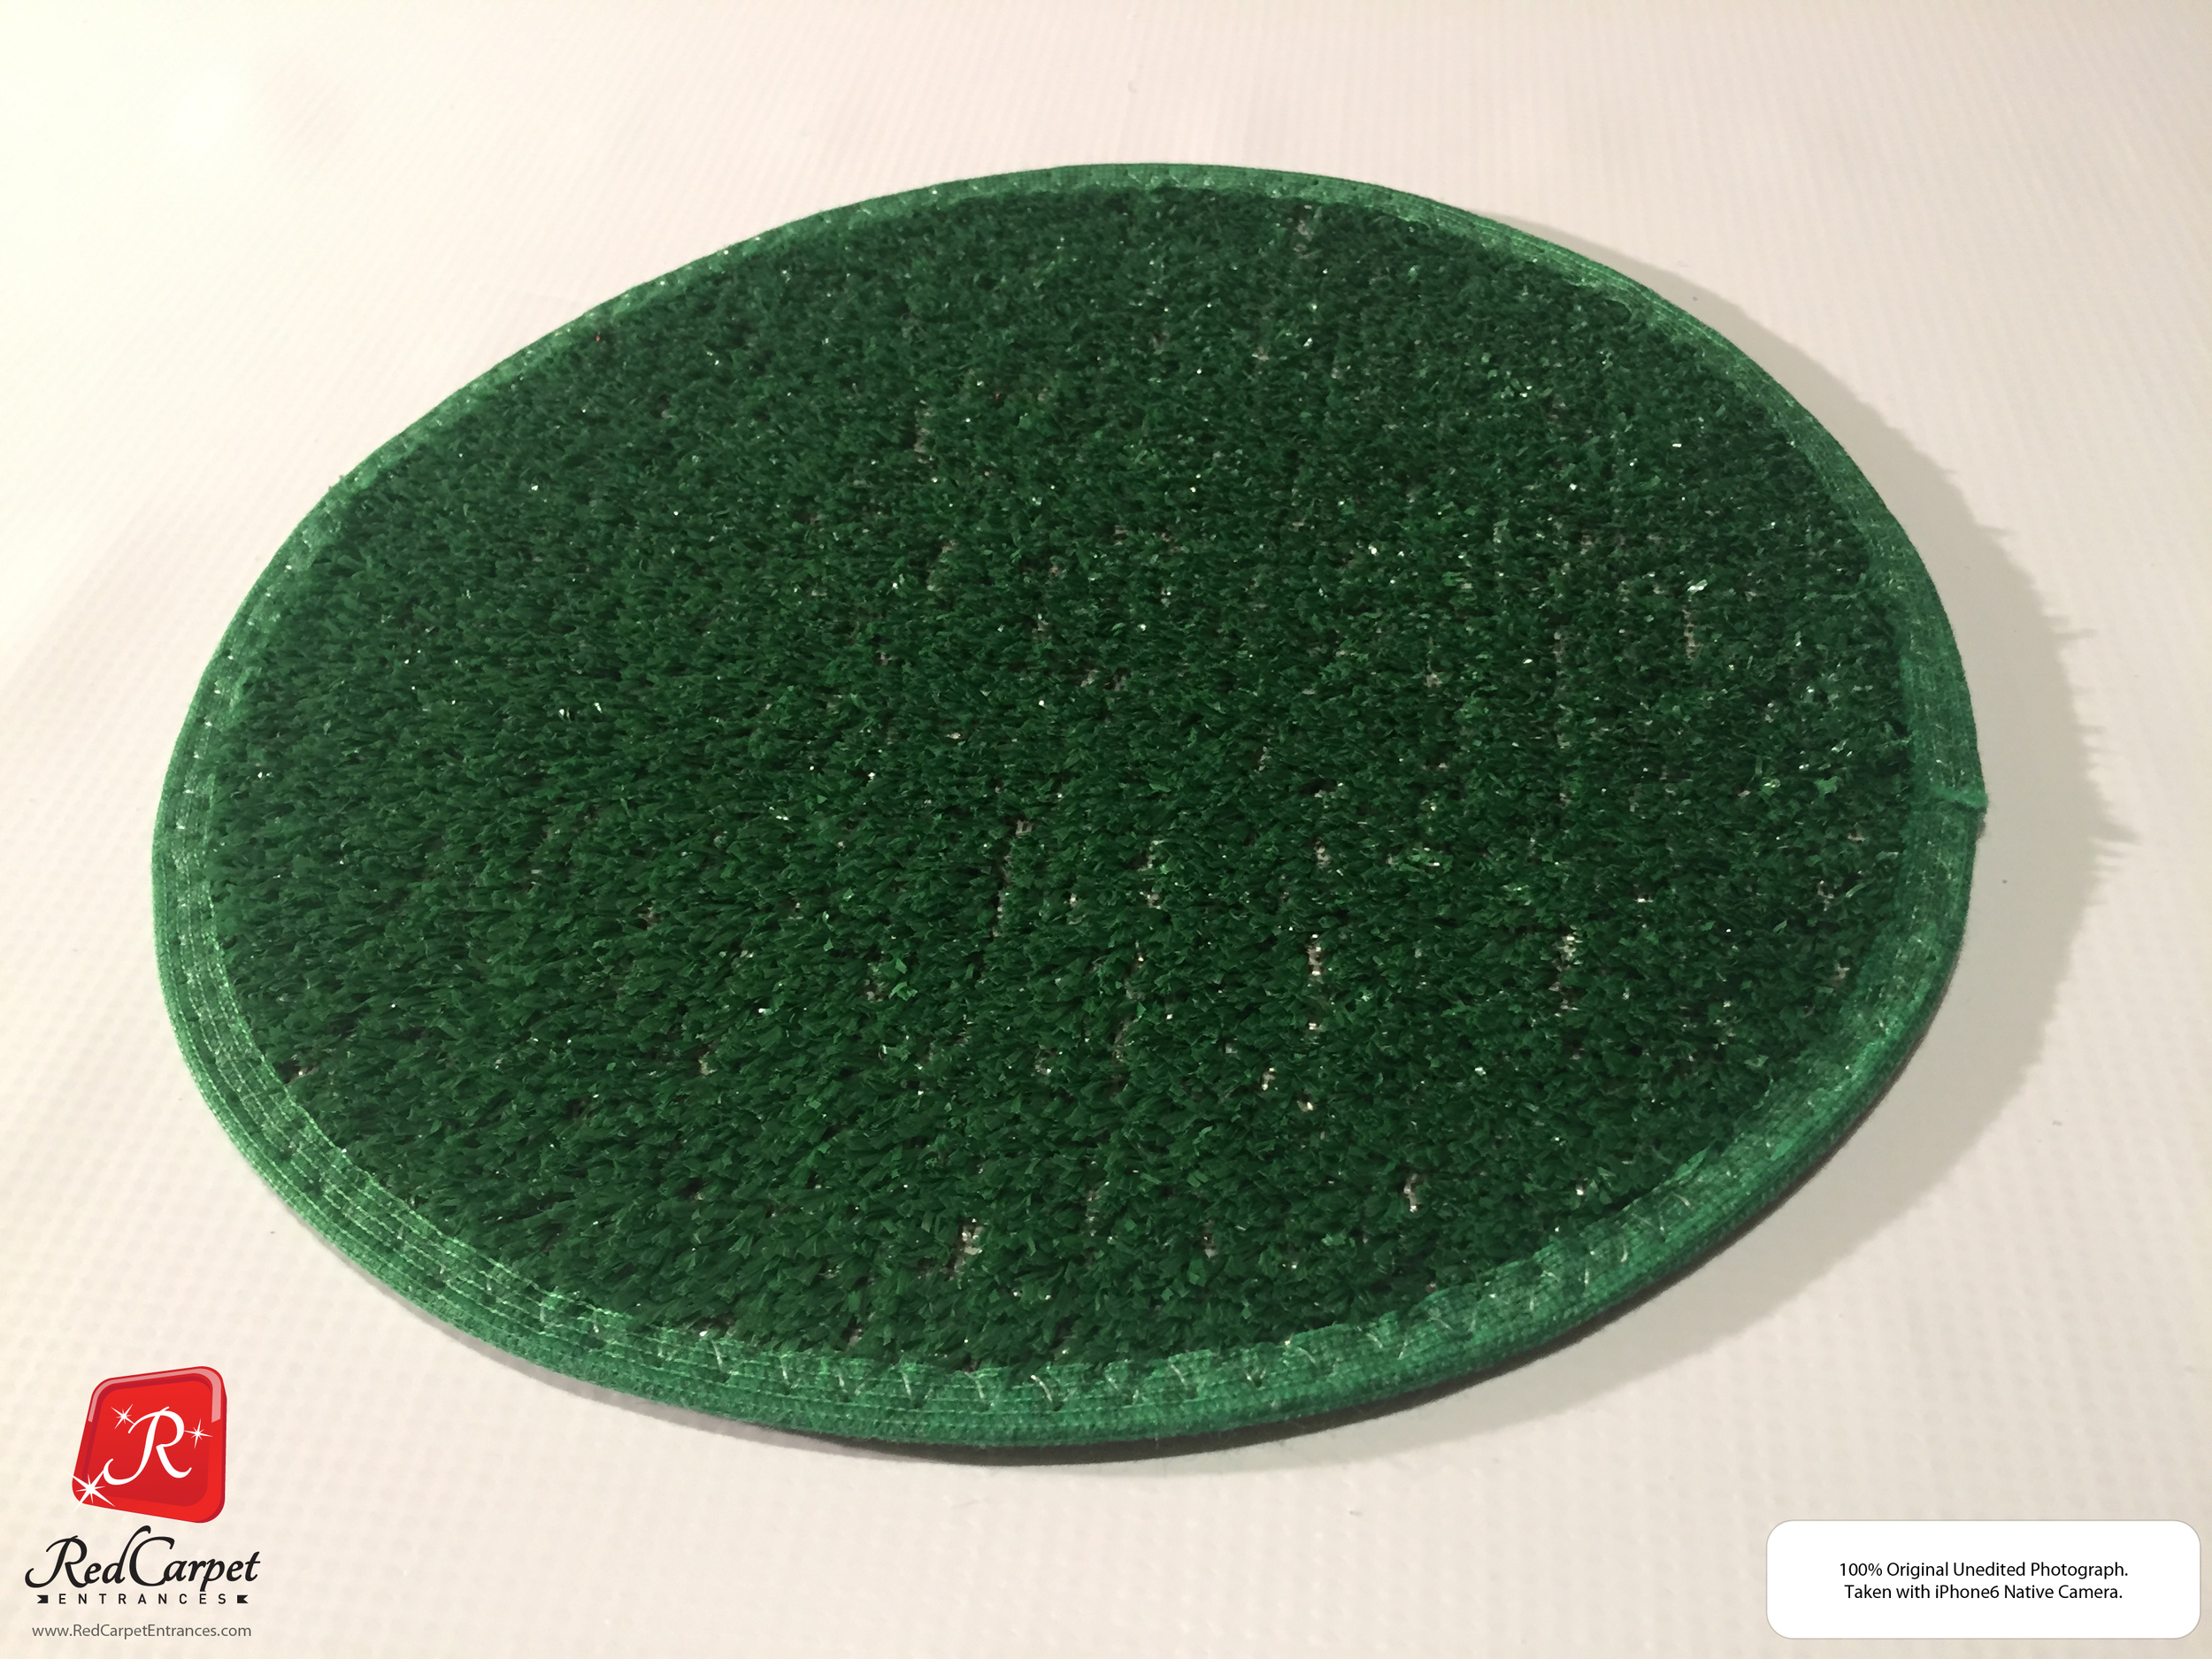 Green Astro Turf